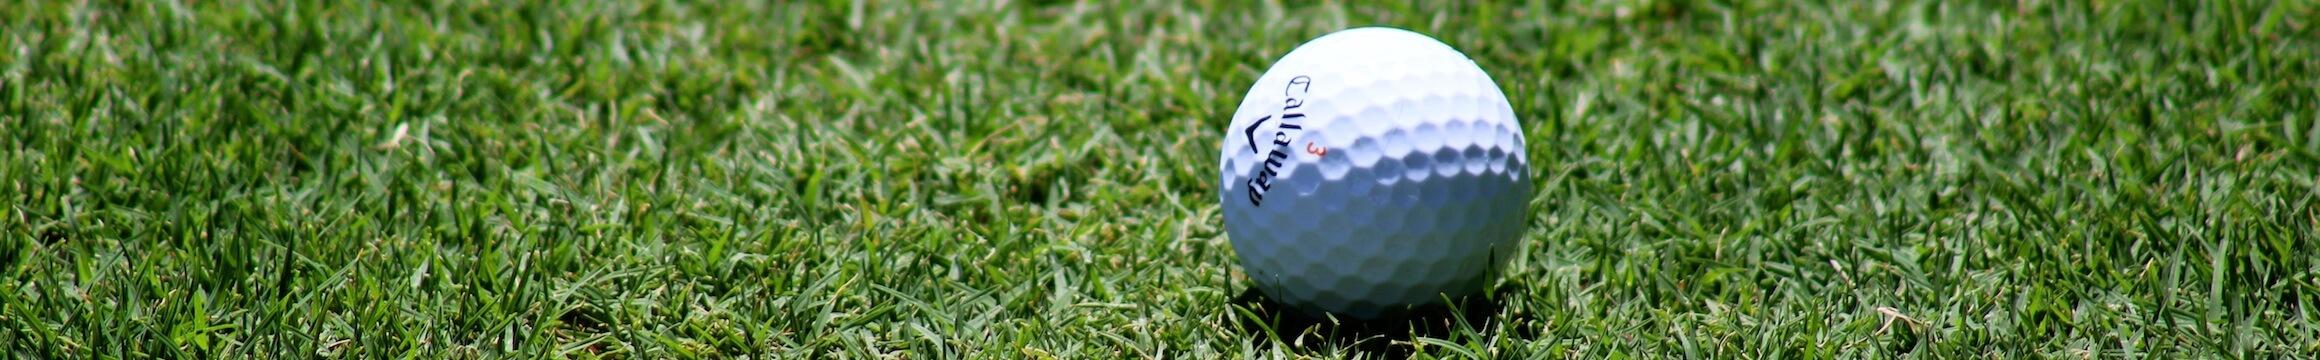 Golf 04